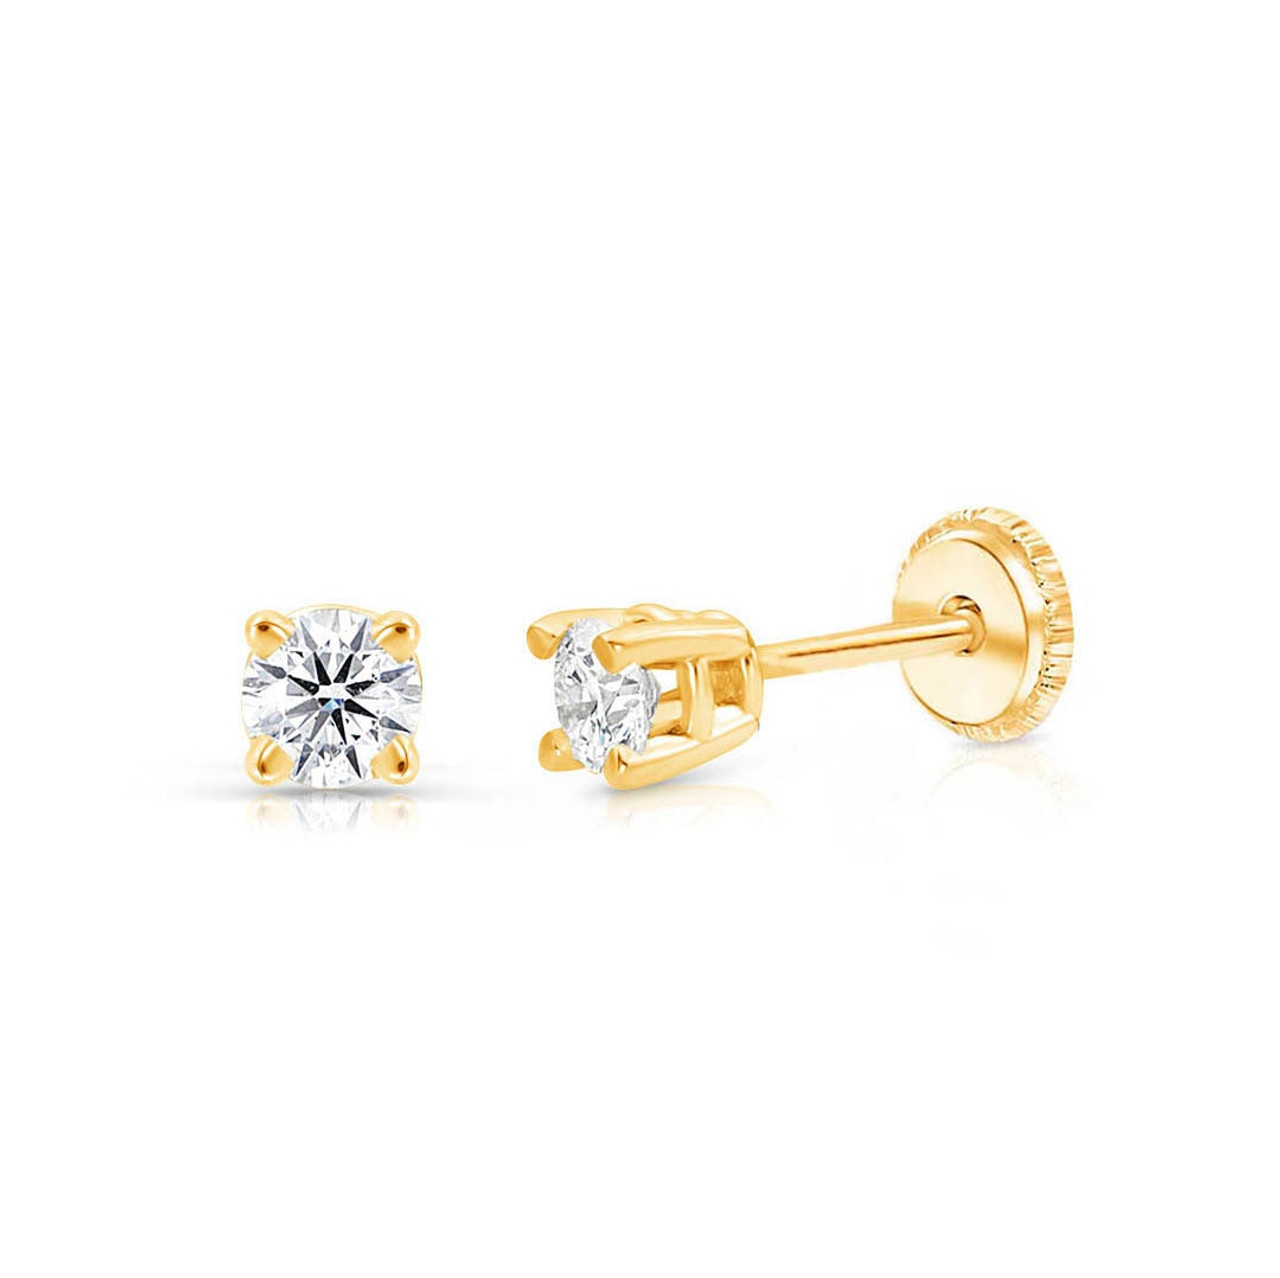 Baby Kids Diamond Earrings Screw Back 12 Tcw 14k Gold The Jeweled Lullaby